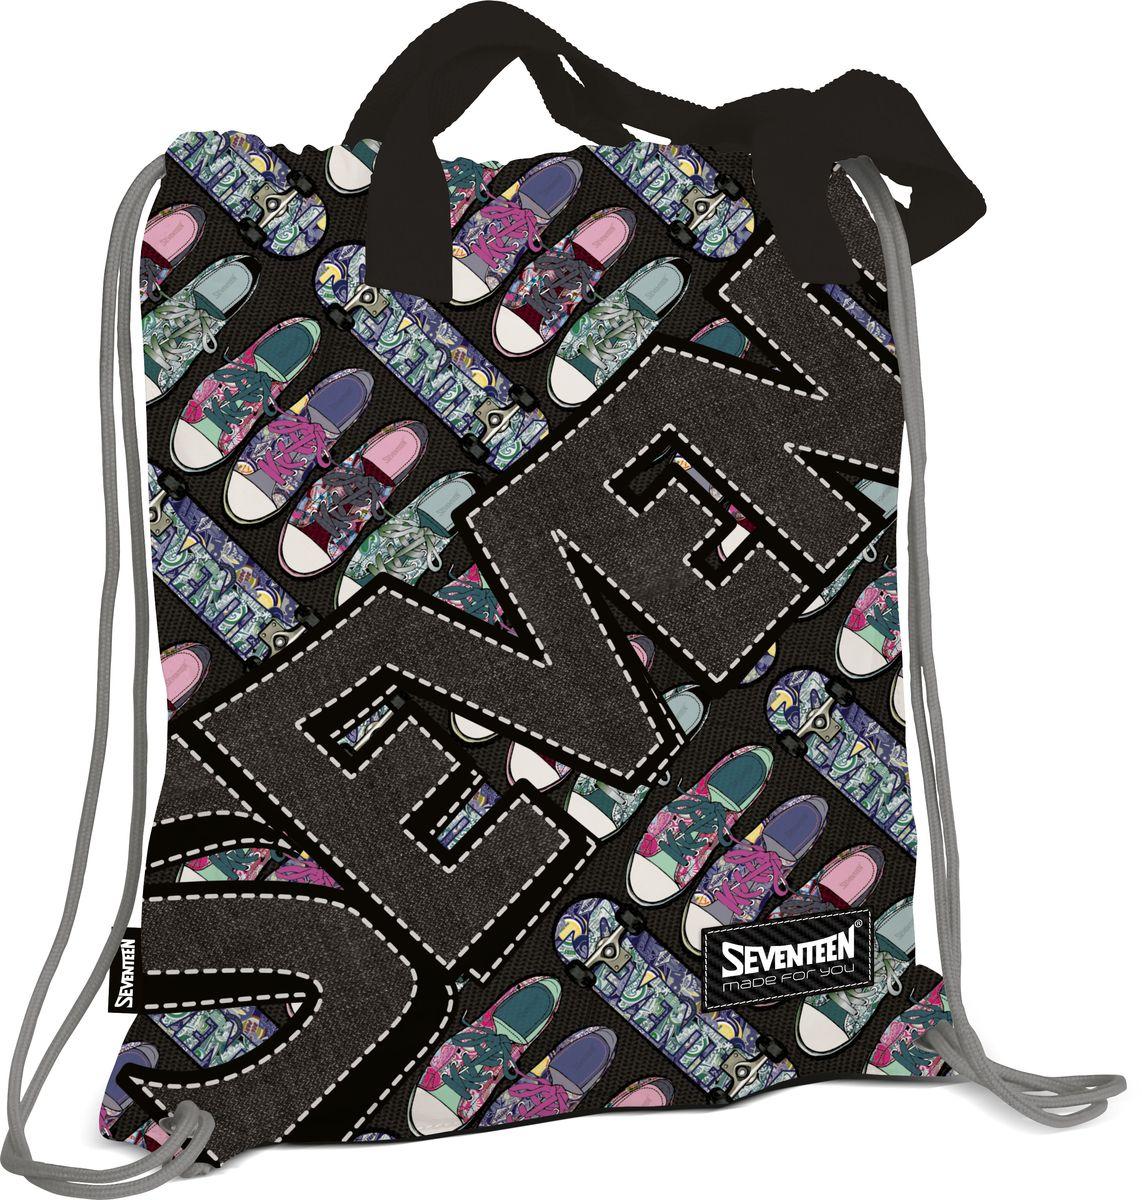 Рюкзак для обуви с ручками Seventeen72523WDСумка-рюкзак для обуви с ручками. Внутри дополнительный карман на молнии для мелочей Размер 43 х 39 х 1 см. Seventeen